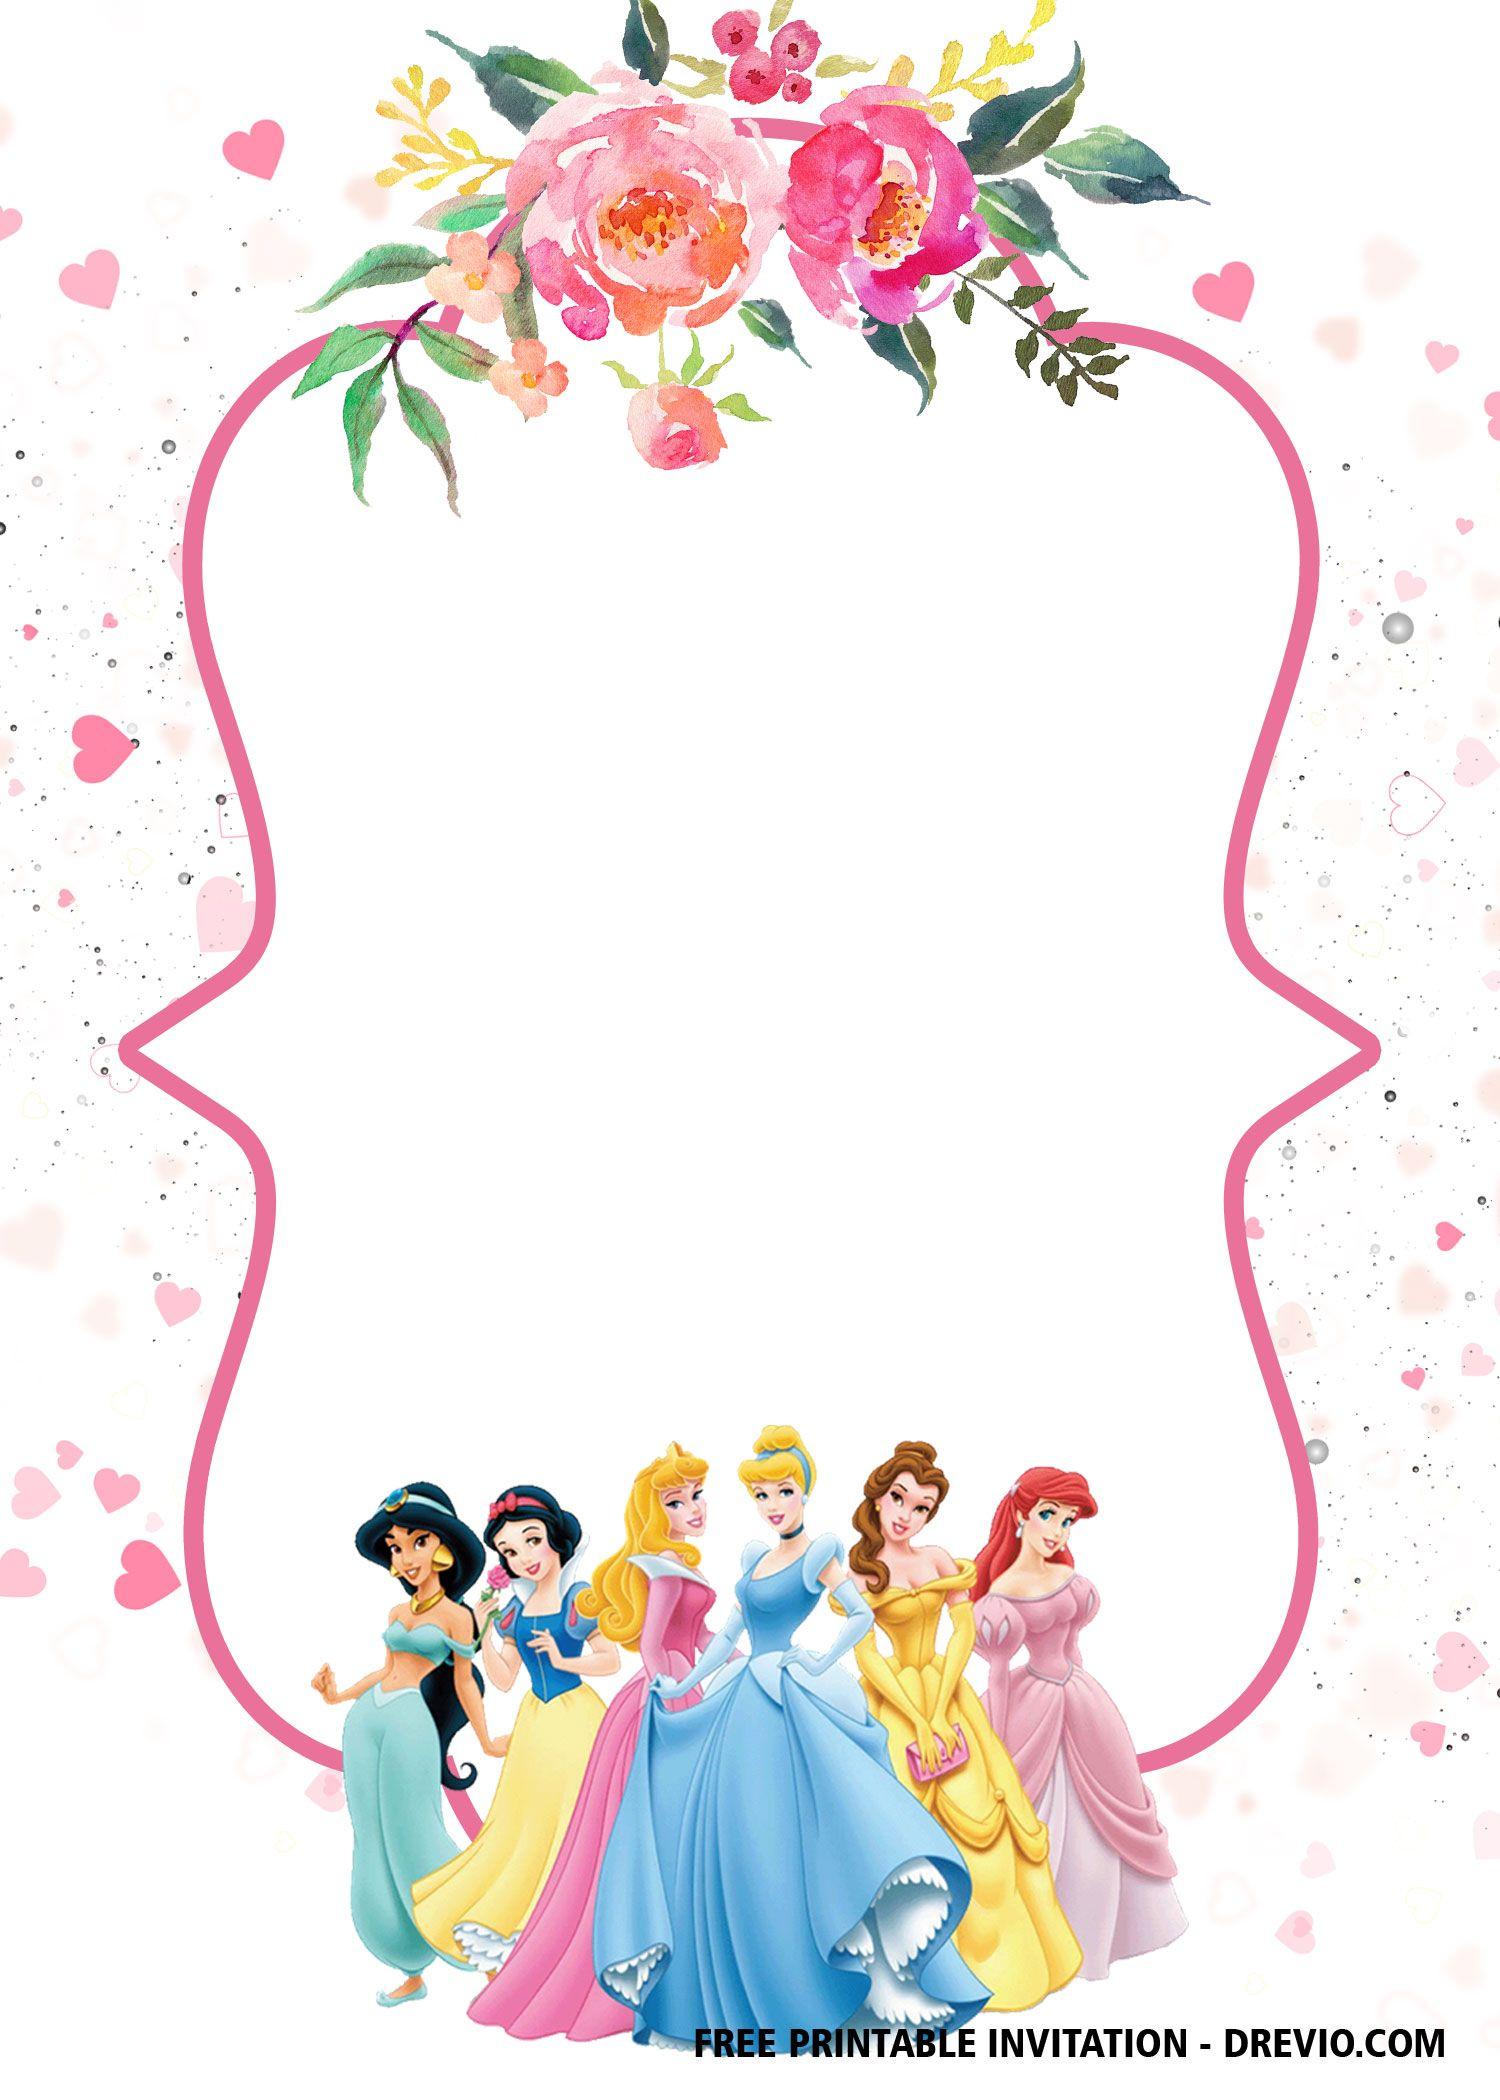 Free Disney Princess Invitation Template For Your Little Girl S Bi Princess Birthday Party Invitations Princess Birthday Invitations Princess Party Invitations